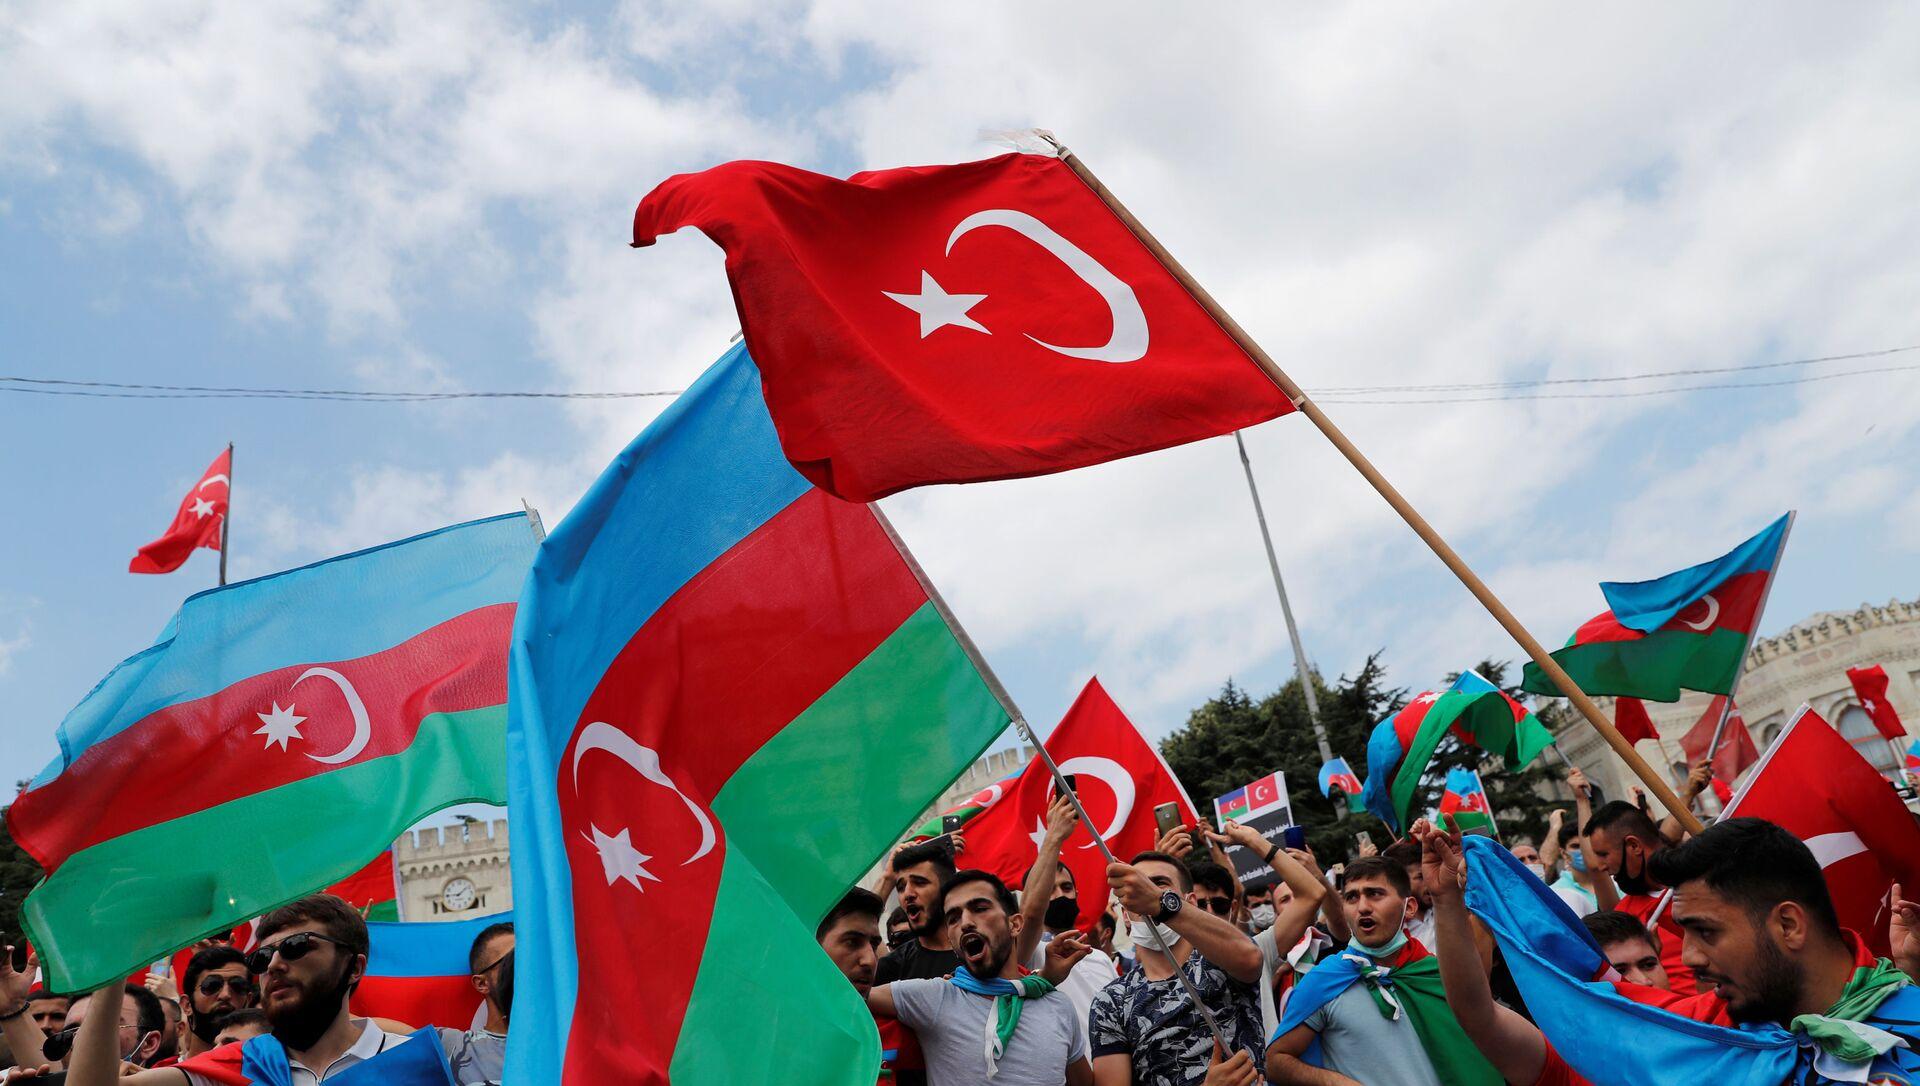 Люди с флагами Турции и Азербайджана, фото из архива - Sputnik Азербайджан, 1920, 30.08.2021